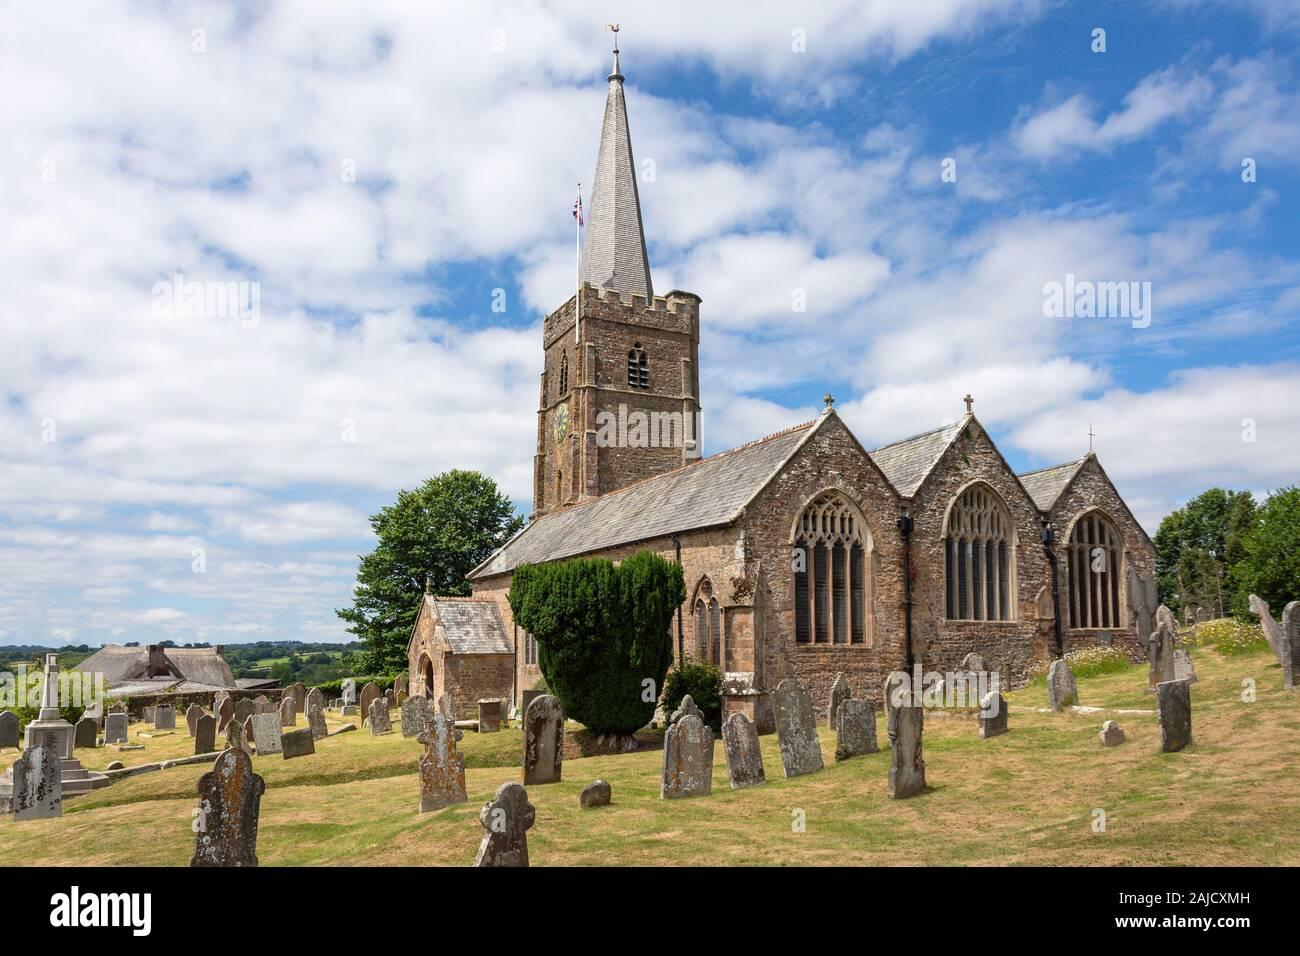 St John the Baptist Church, Church Lane, Hatherleigh, Devon, Angleterre, Royaume-Uni Banque D'Images